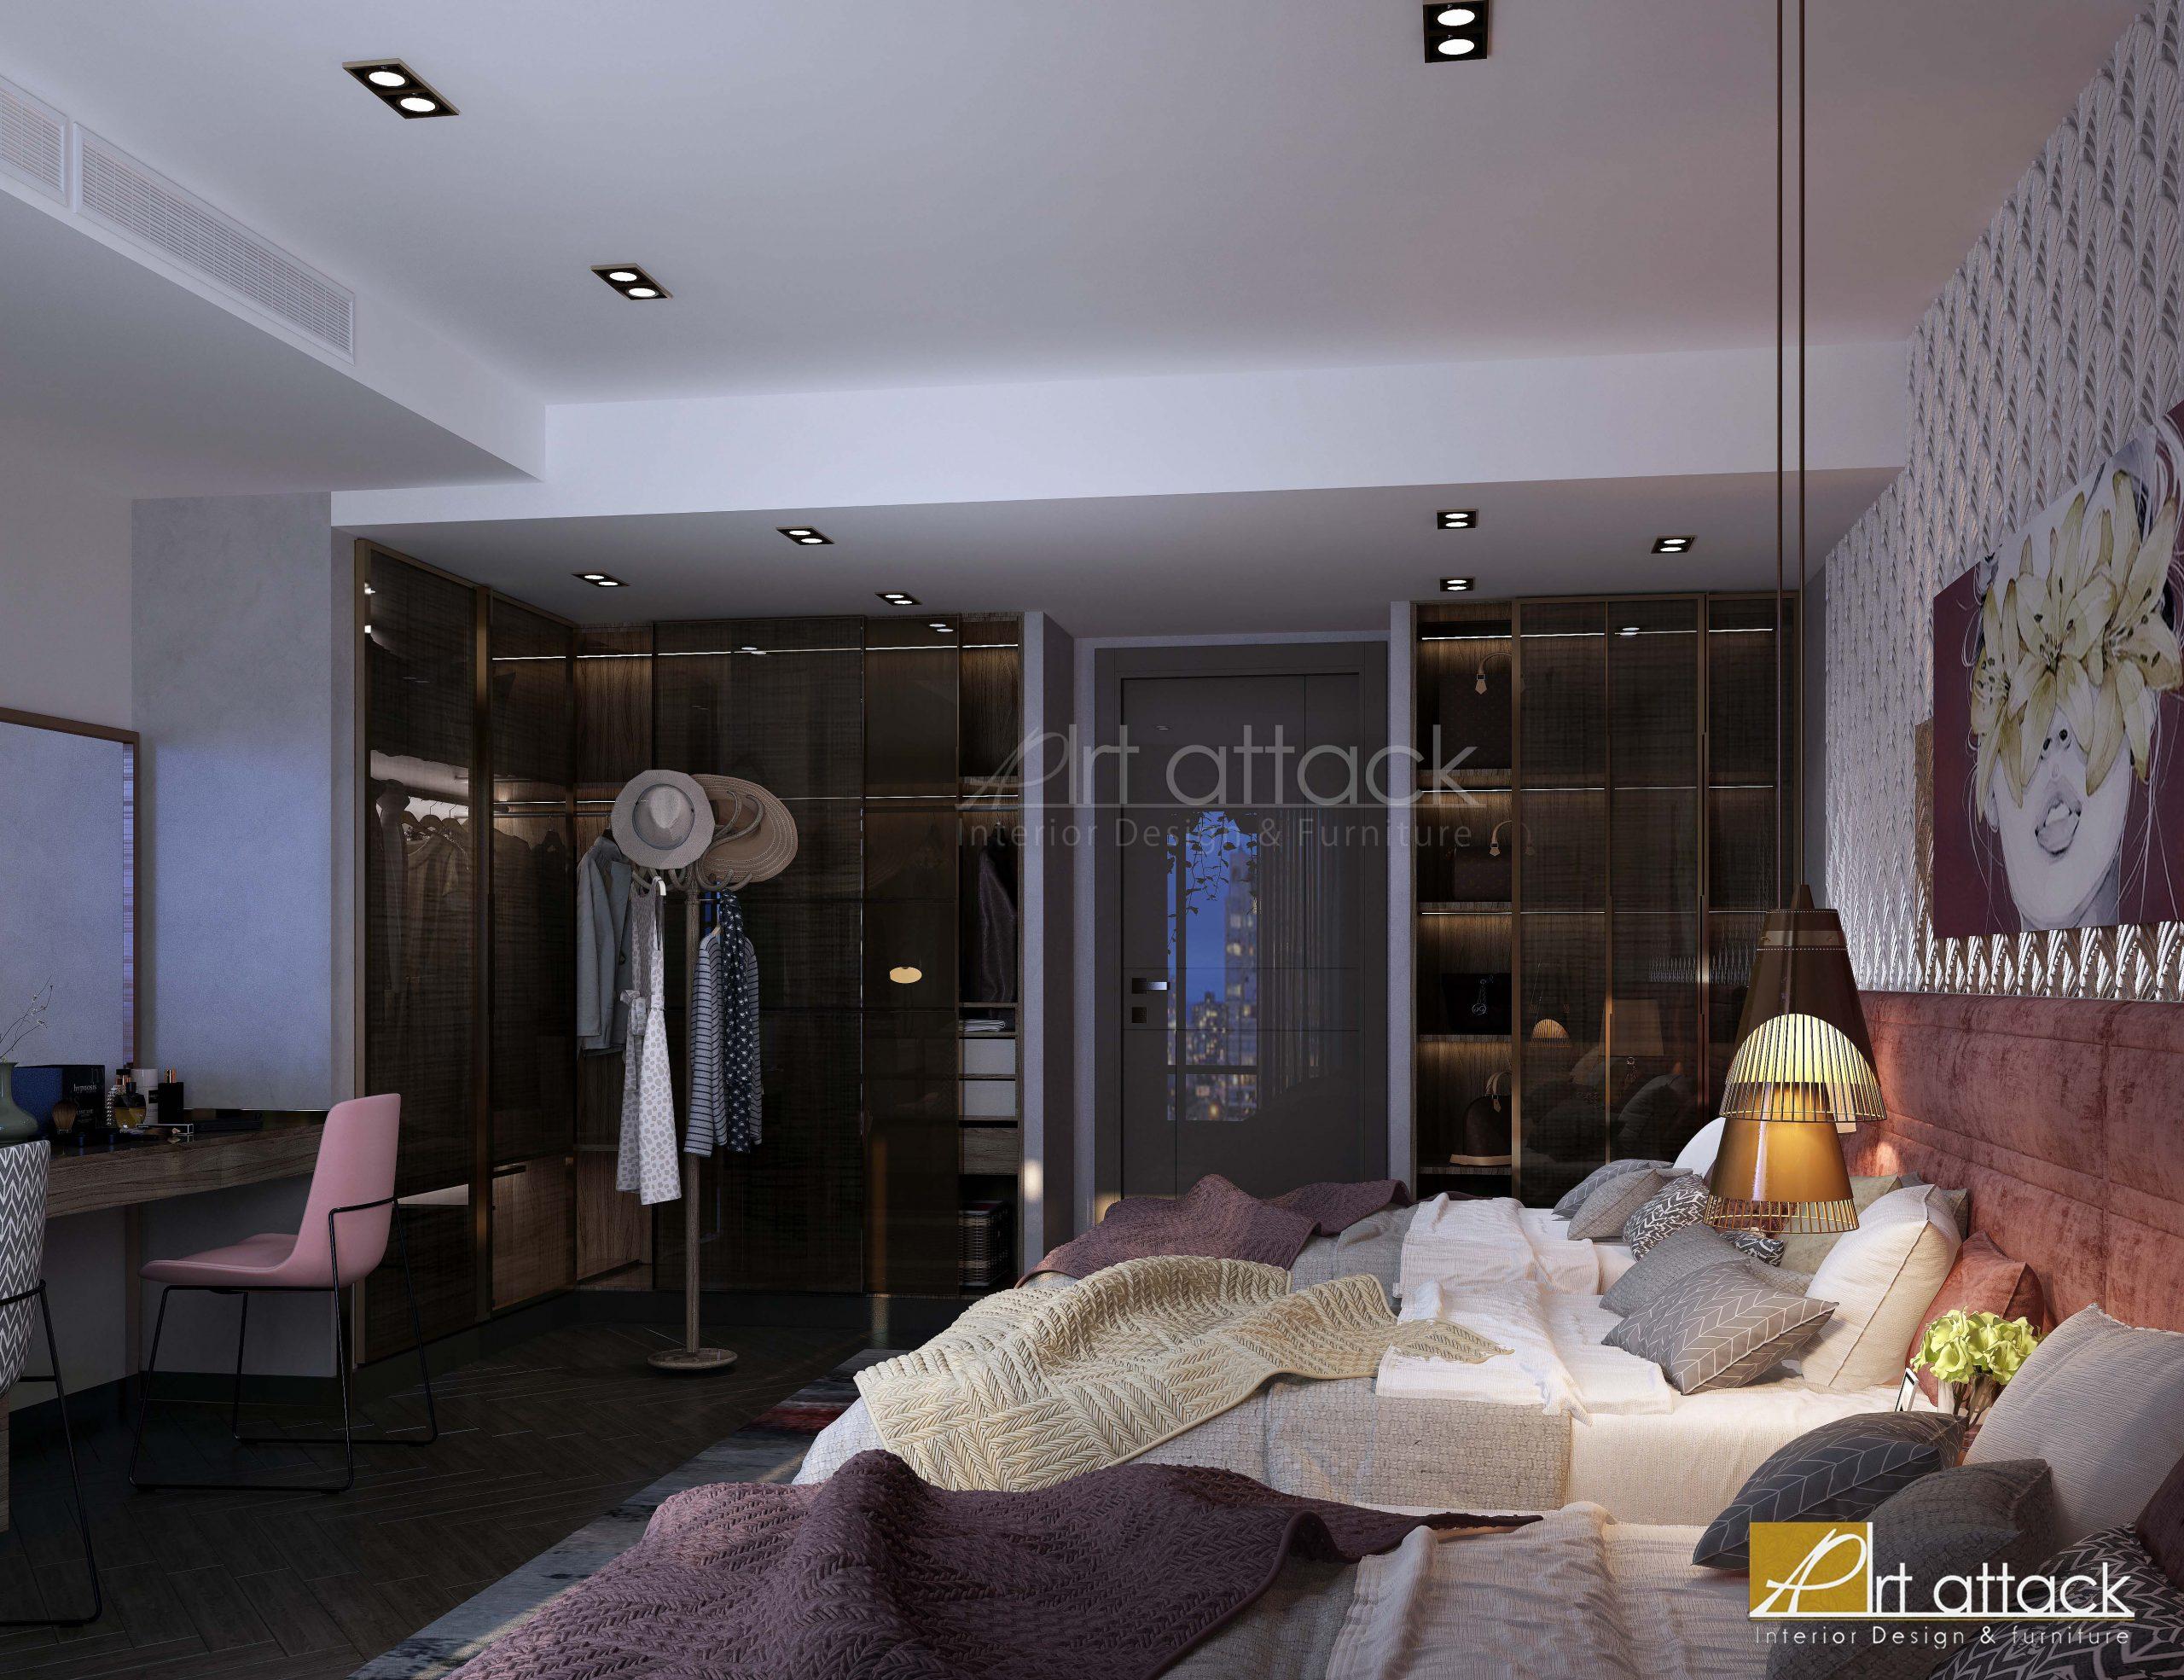 شركة ديكور بالقاهرة,مصمم ديكور بالقاهرة,شركة ديكور بالرحاب,غرف نوم بنات مودرن,interiordesign,decoration,design,decor,exteriordesign,modern,classic,jpg